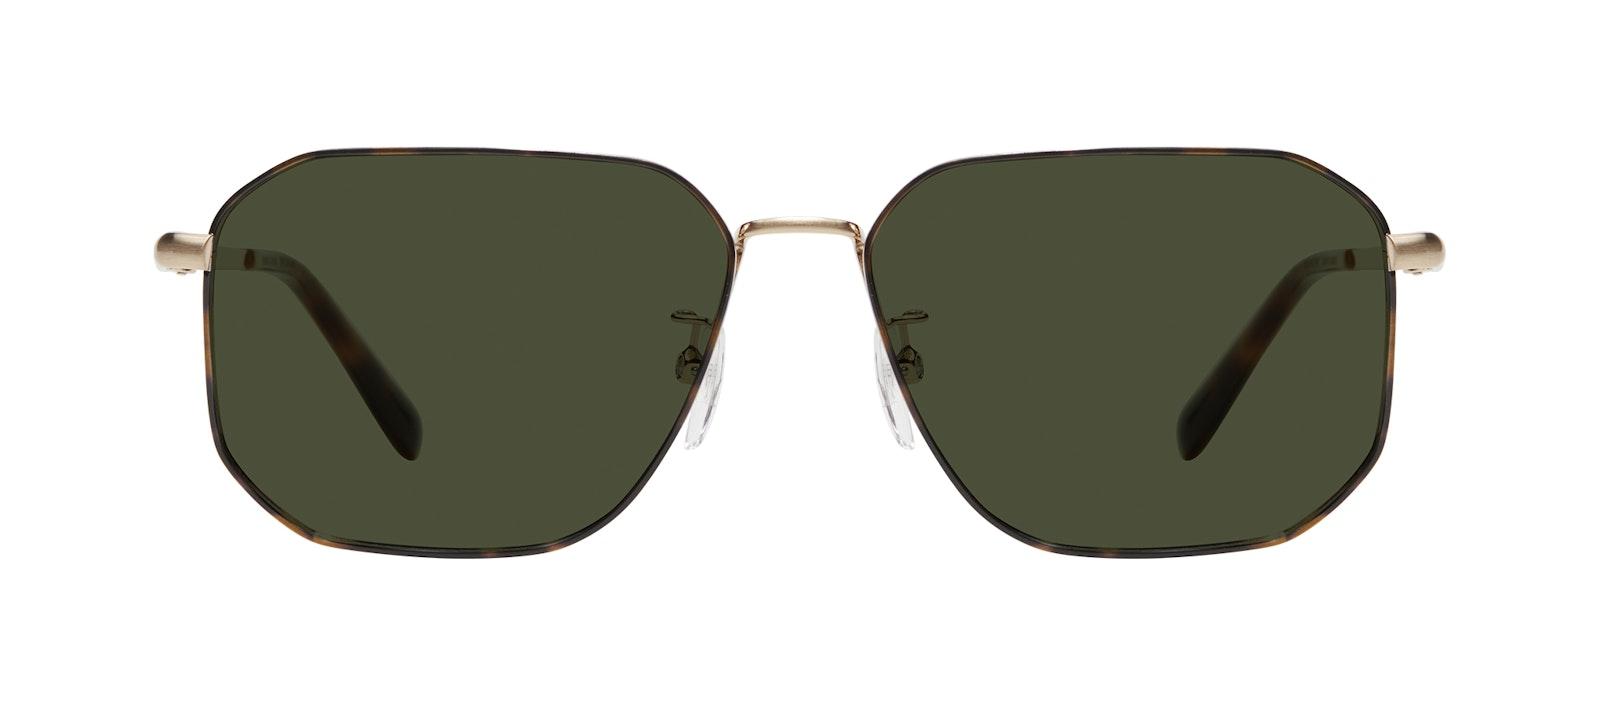 Affordable Fashion Glasses Square Sunglasses Men Timeless Tortoise Front